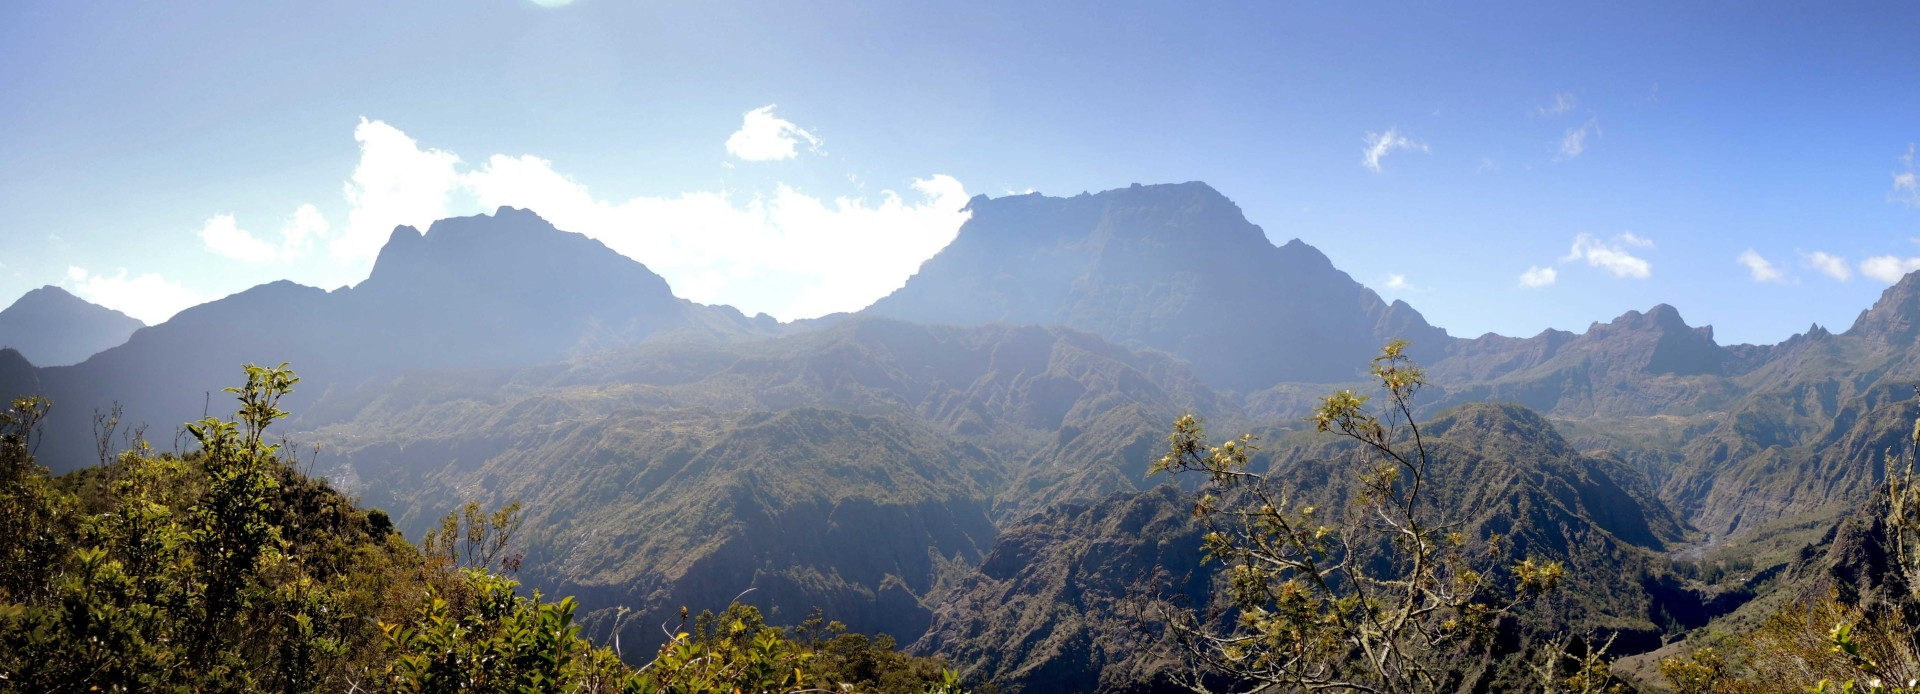 La Réunion Panorama im Talkessel von Mafate